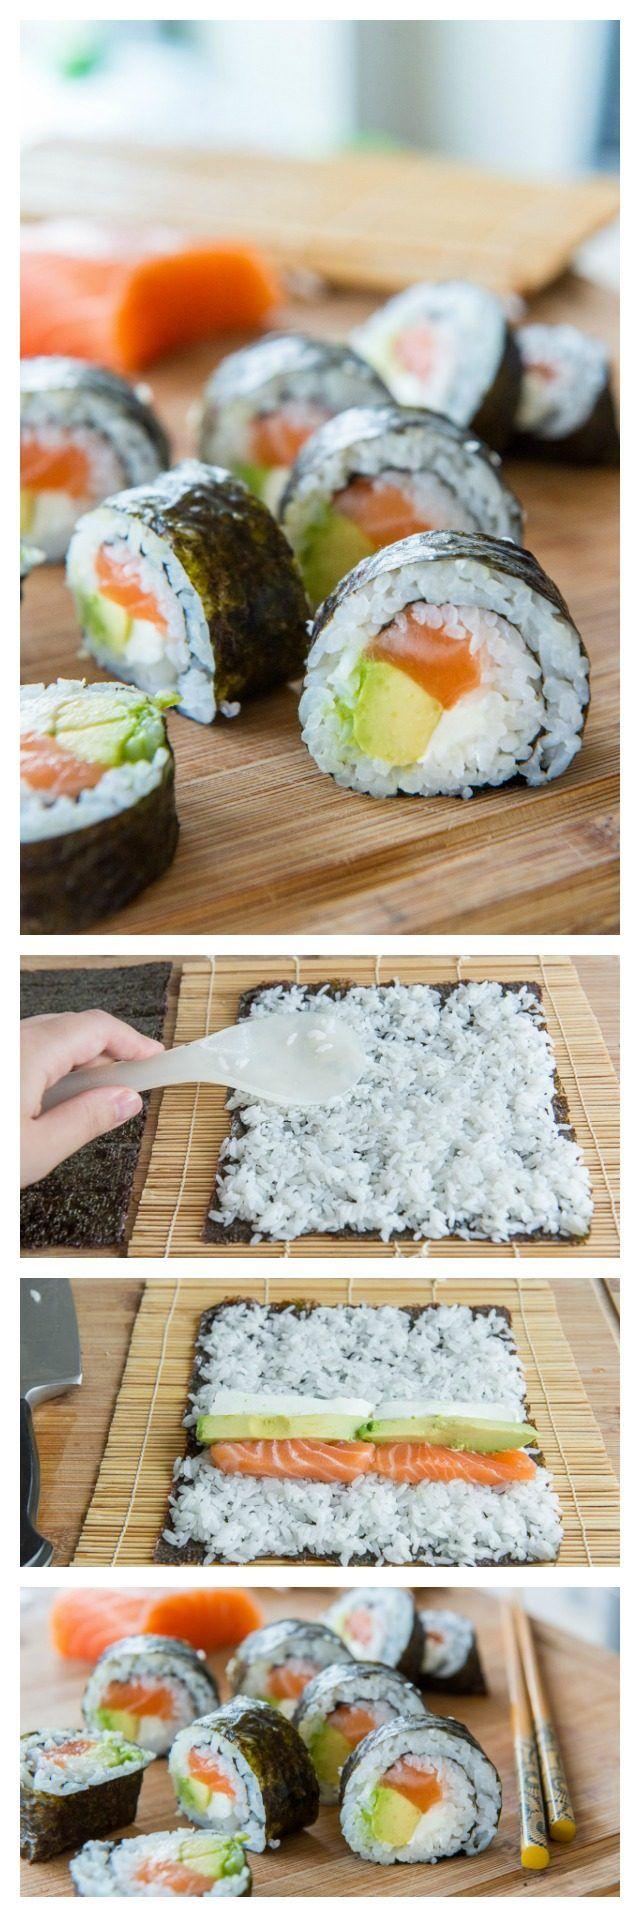 Homemade Sushi Recipe How To Make Sushi At Home Recipe Homemade Sushi Sushi Recipes Homemade Sushi At Home